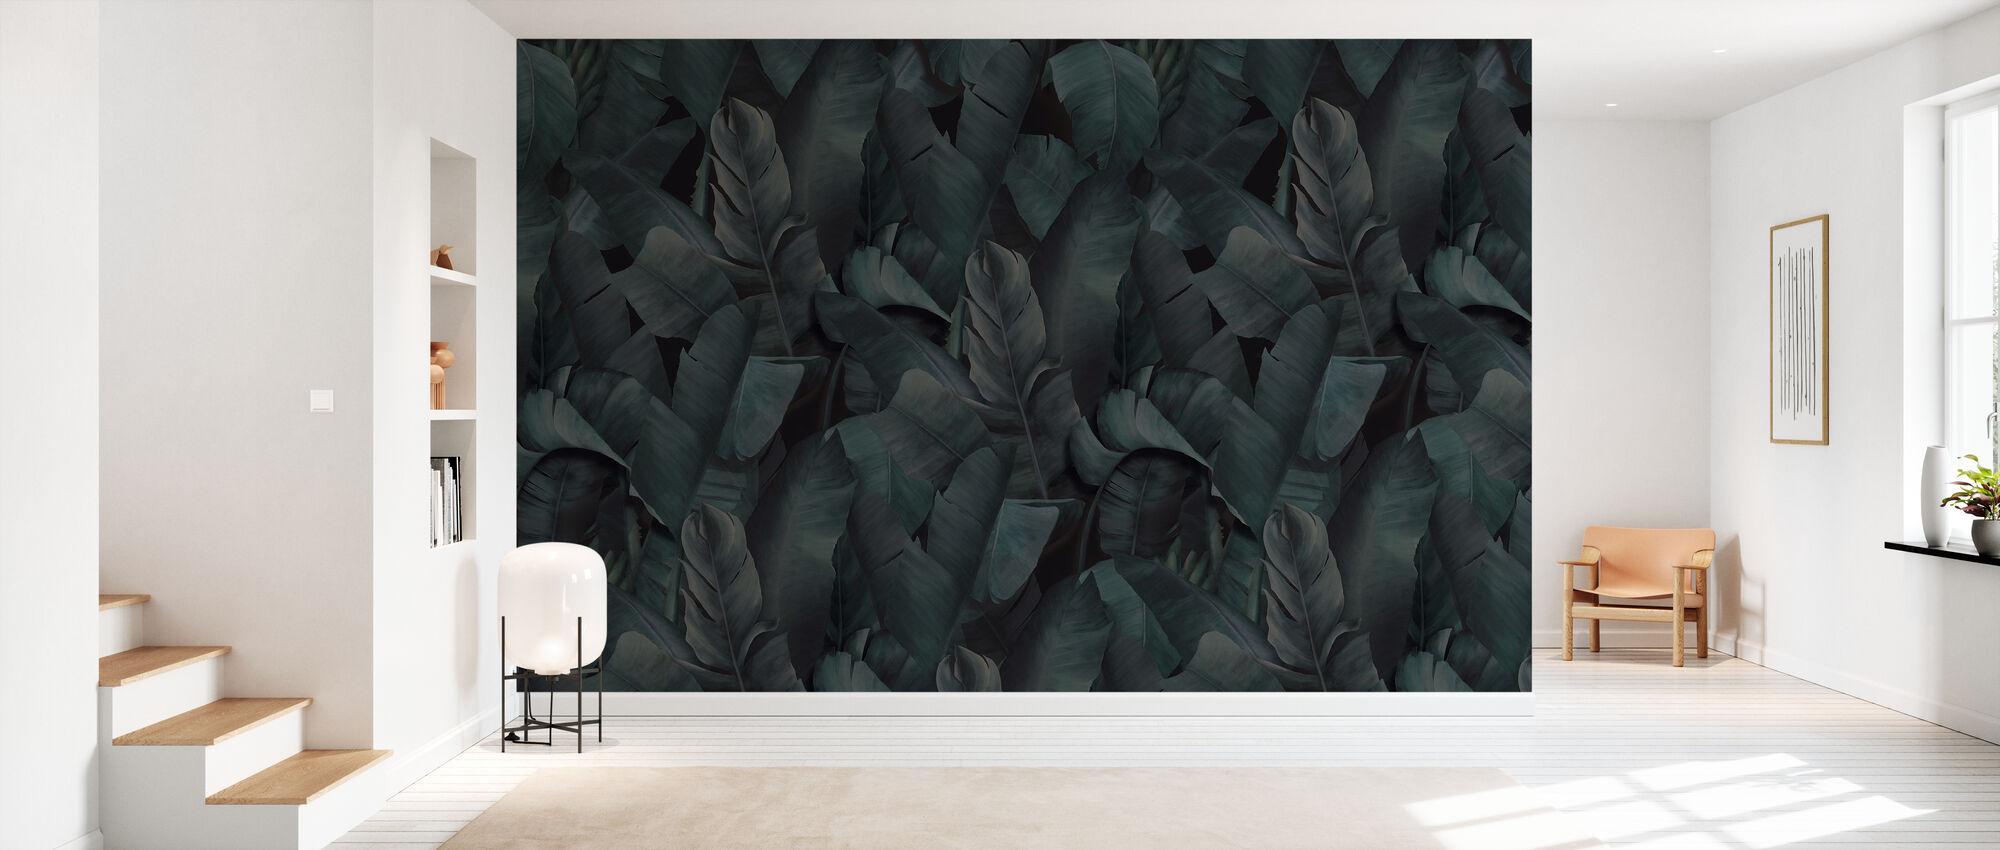 Botany Tropical Emerald Green - Wallpaper - Hallway